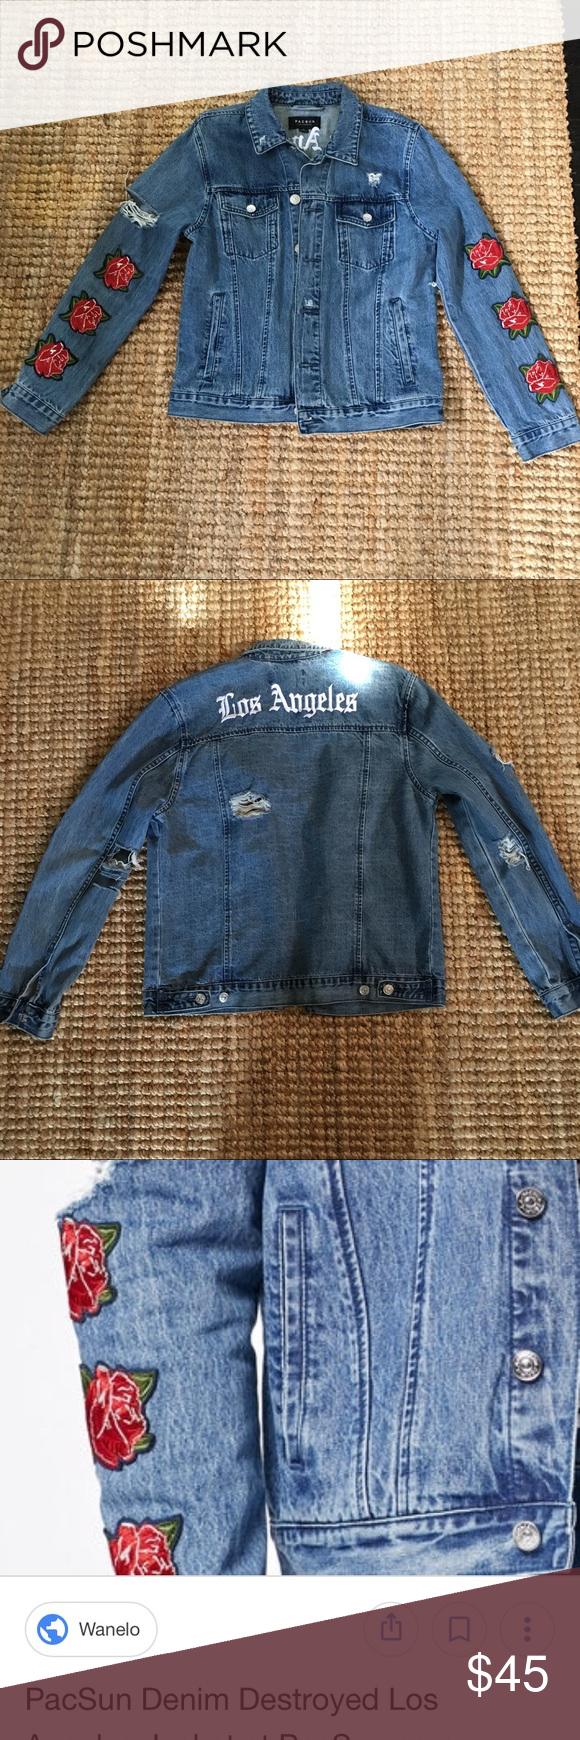 Rare Pacsun Denim Rose Embroidered Jacket In 2018 My Posh Picks